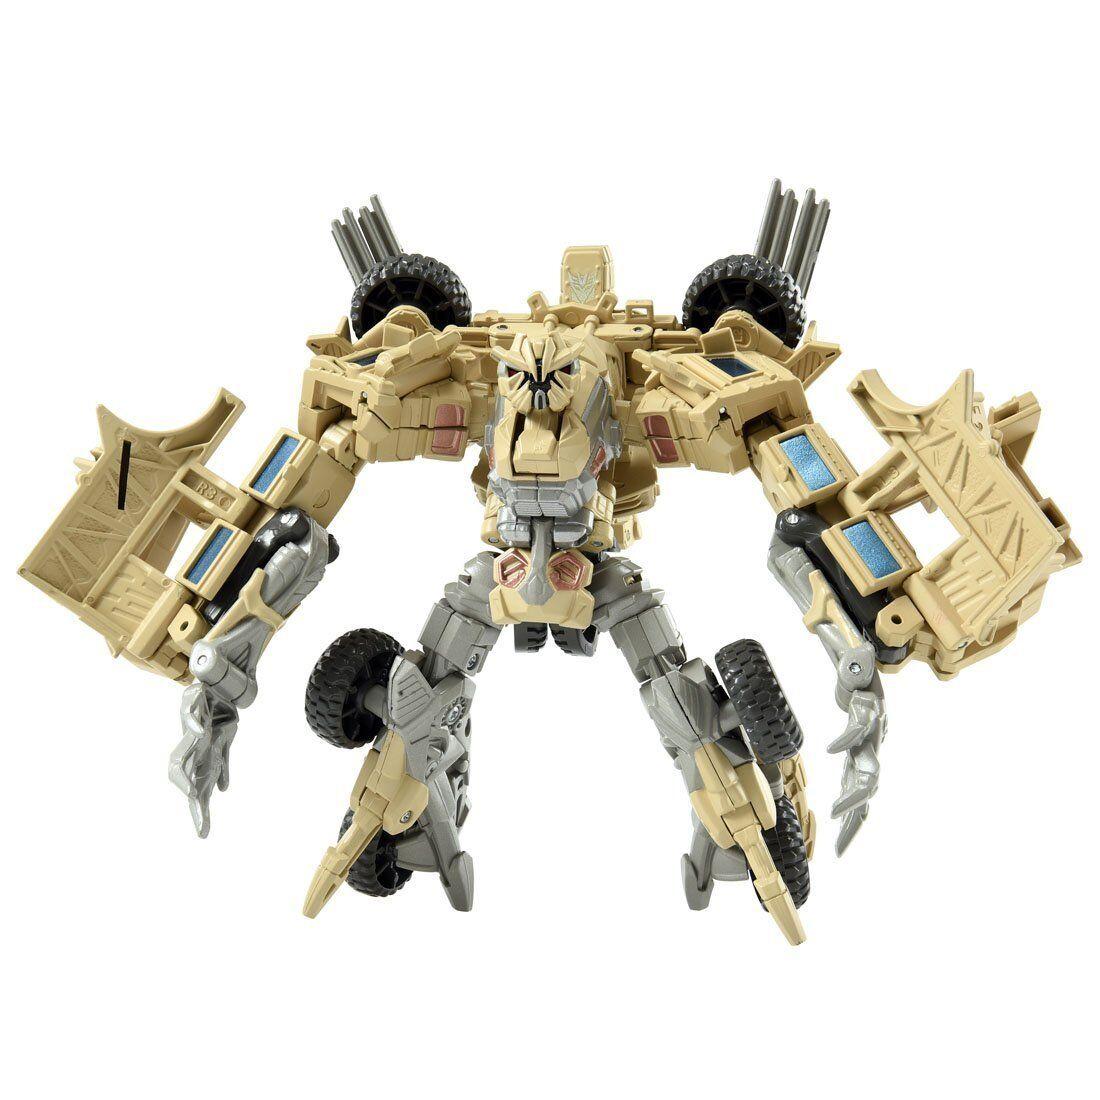 Takara Tomy Transformers MB-13 BONE CRUSHER Action Figure